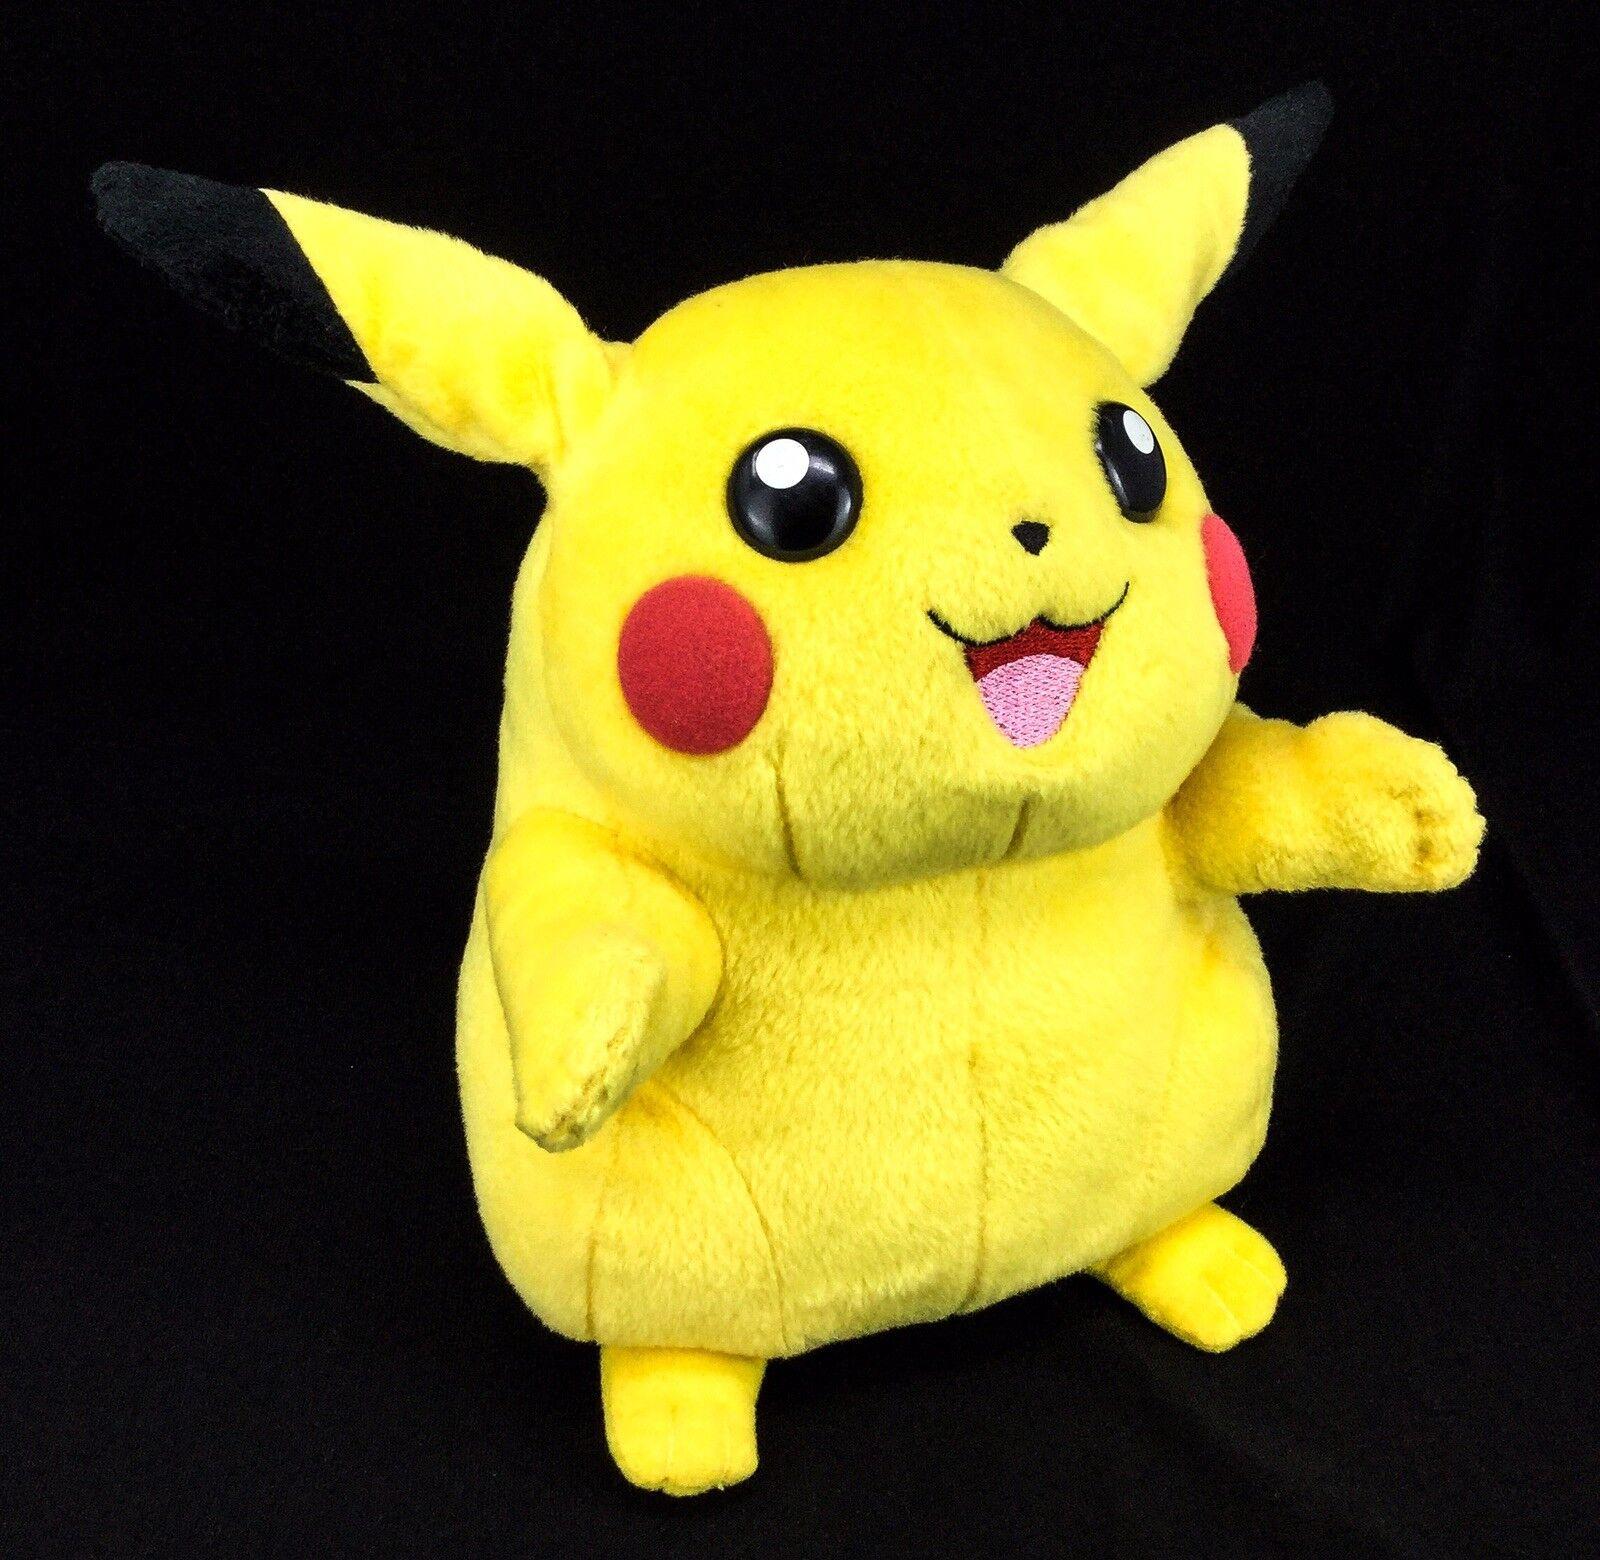 2005 Hasbro Pokemon Battle-Ready Pikachu Pikachu Electronic Lights & Sounds Plush Toy